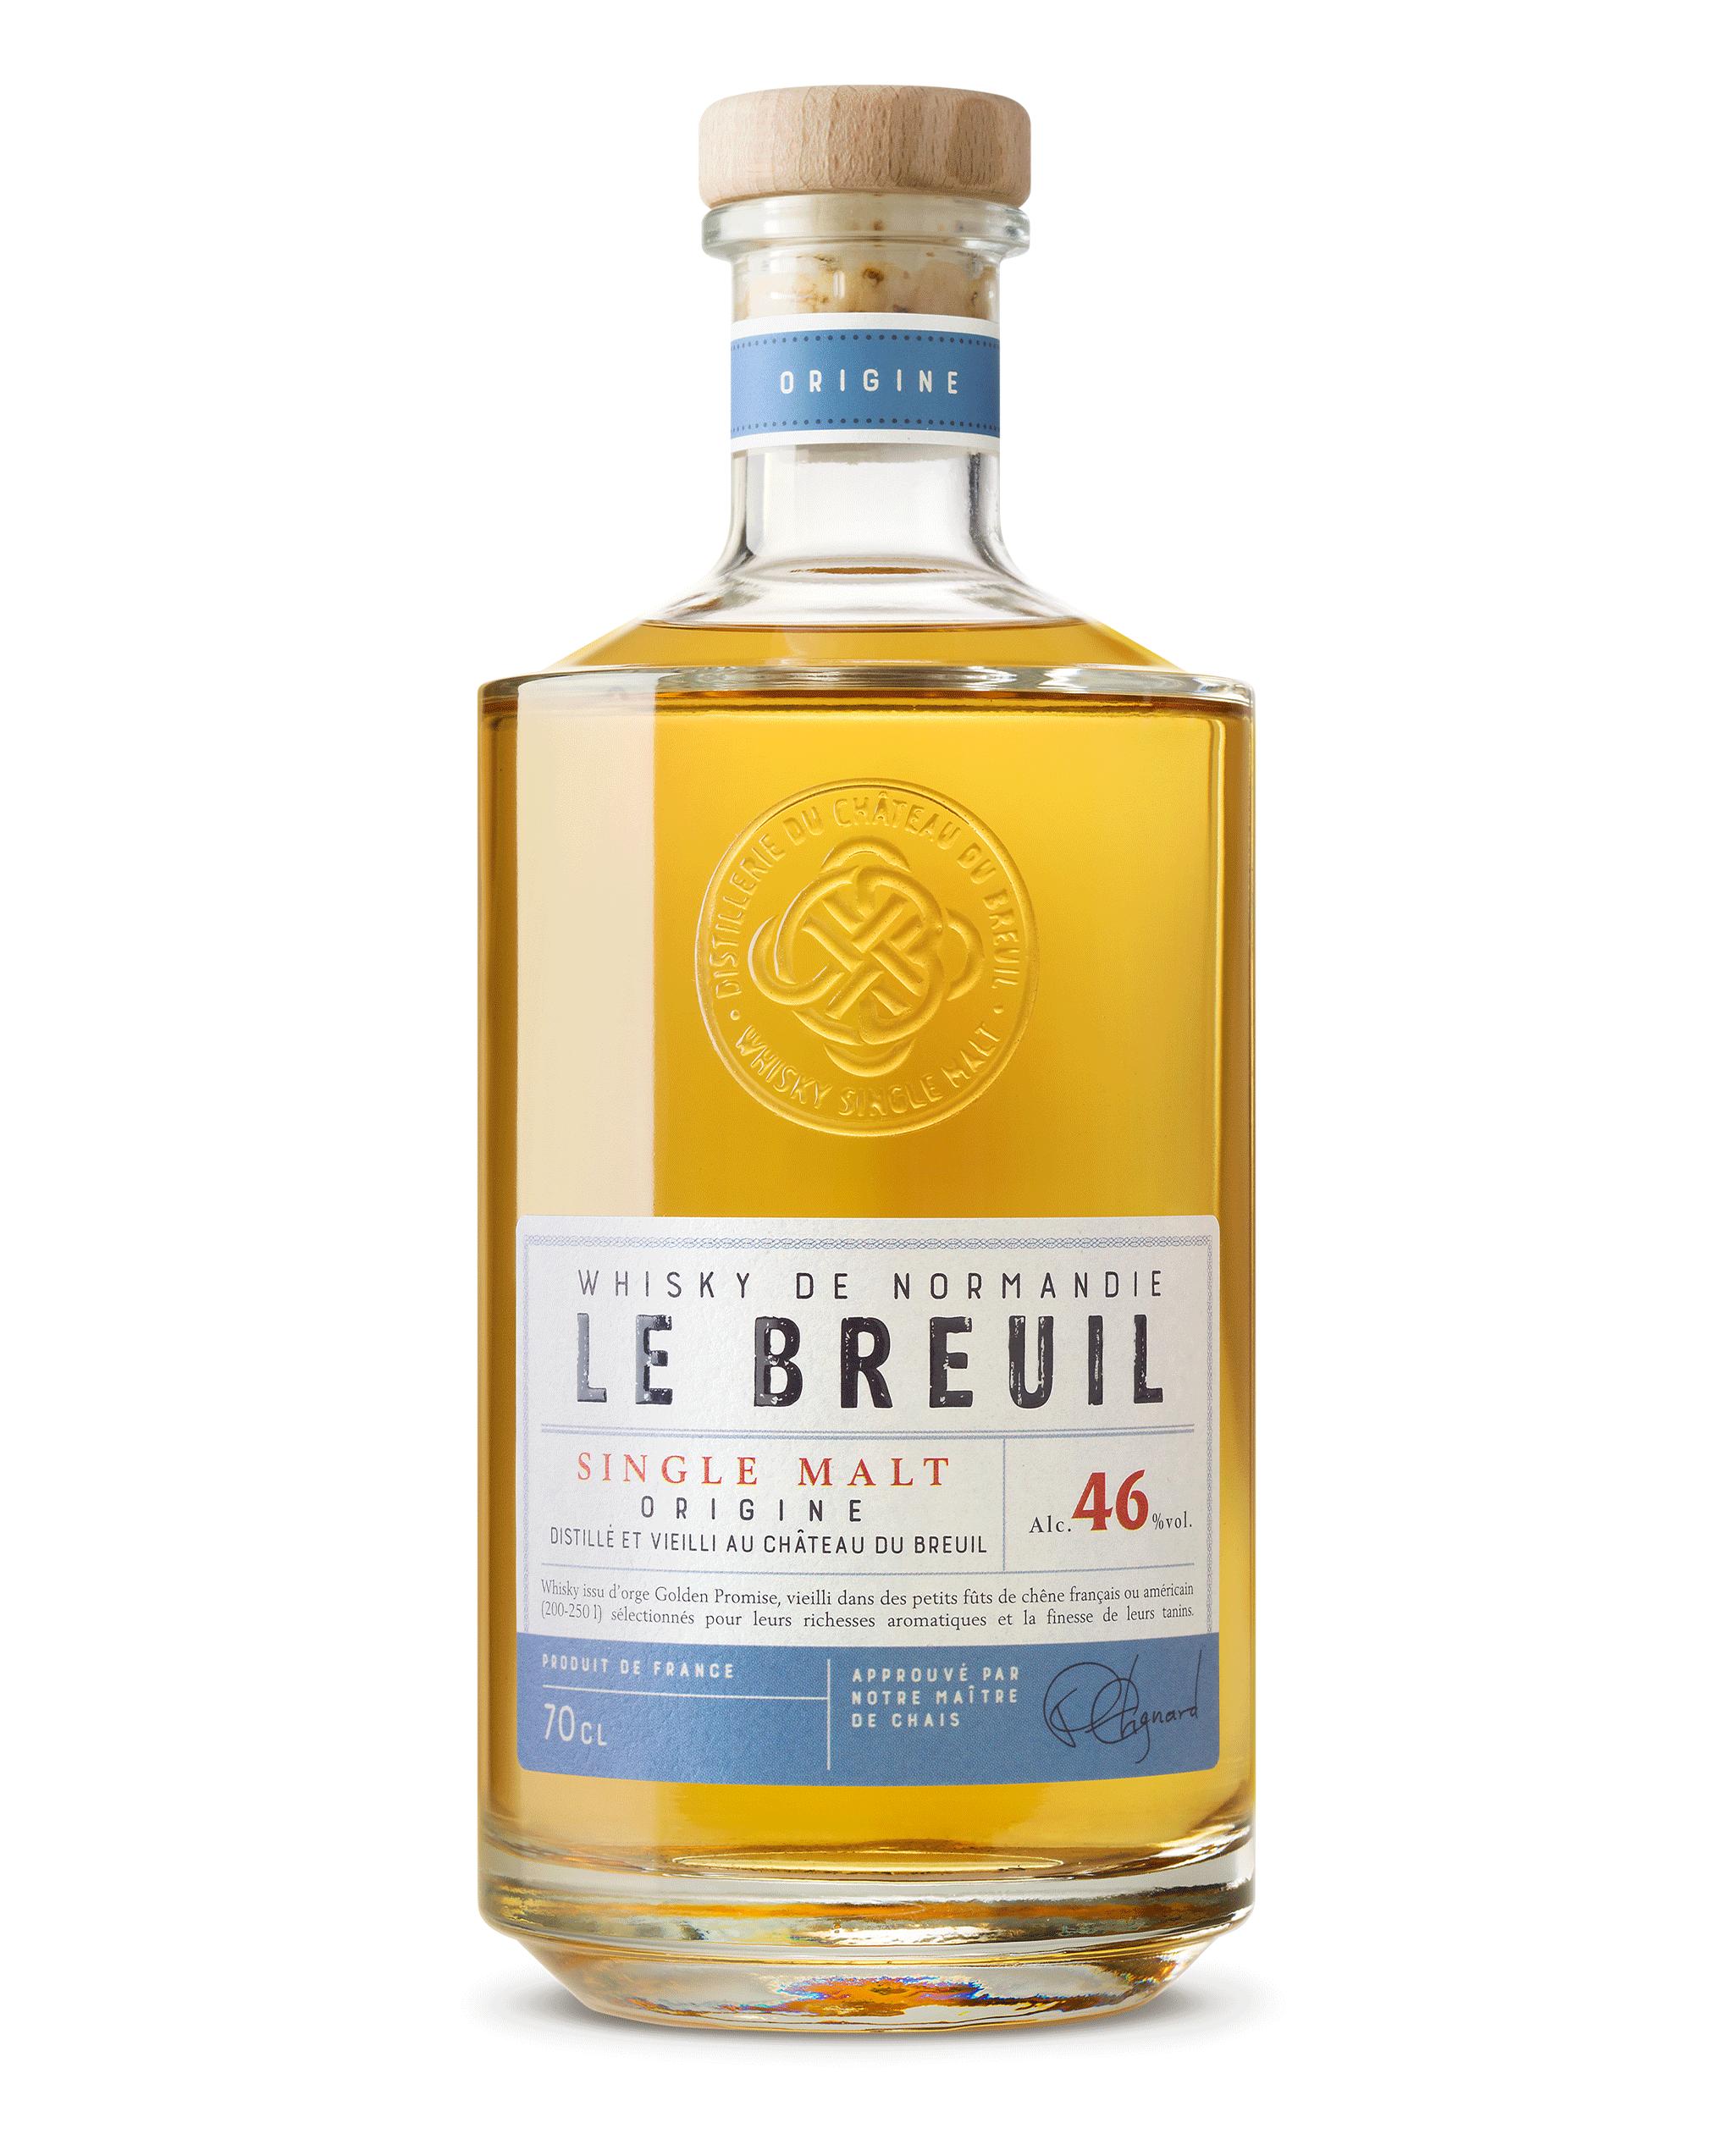 Visuel Bouteille Whisky Origine